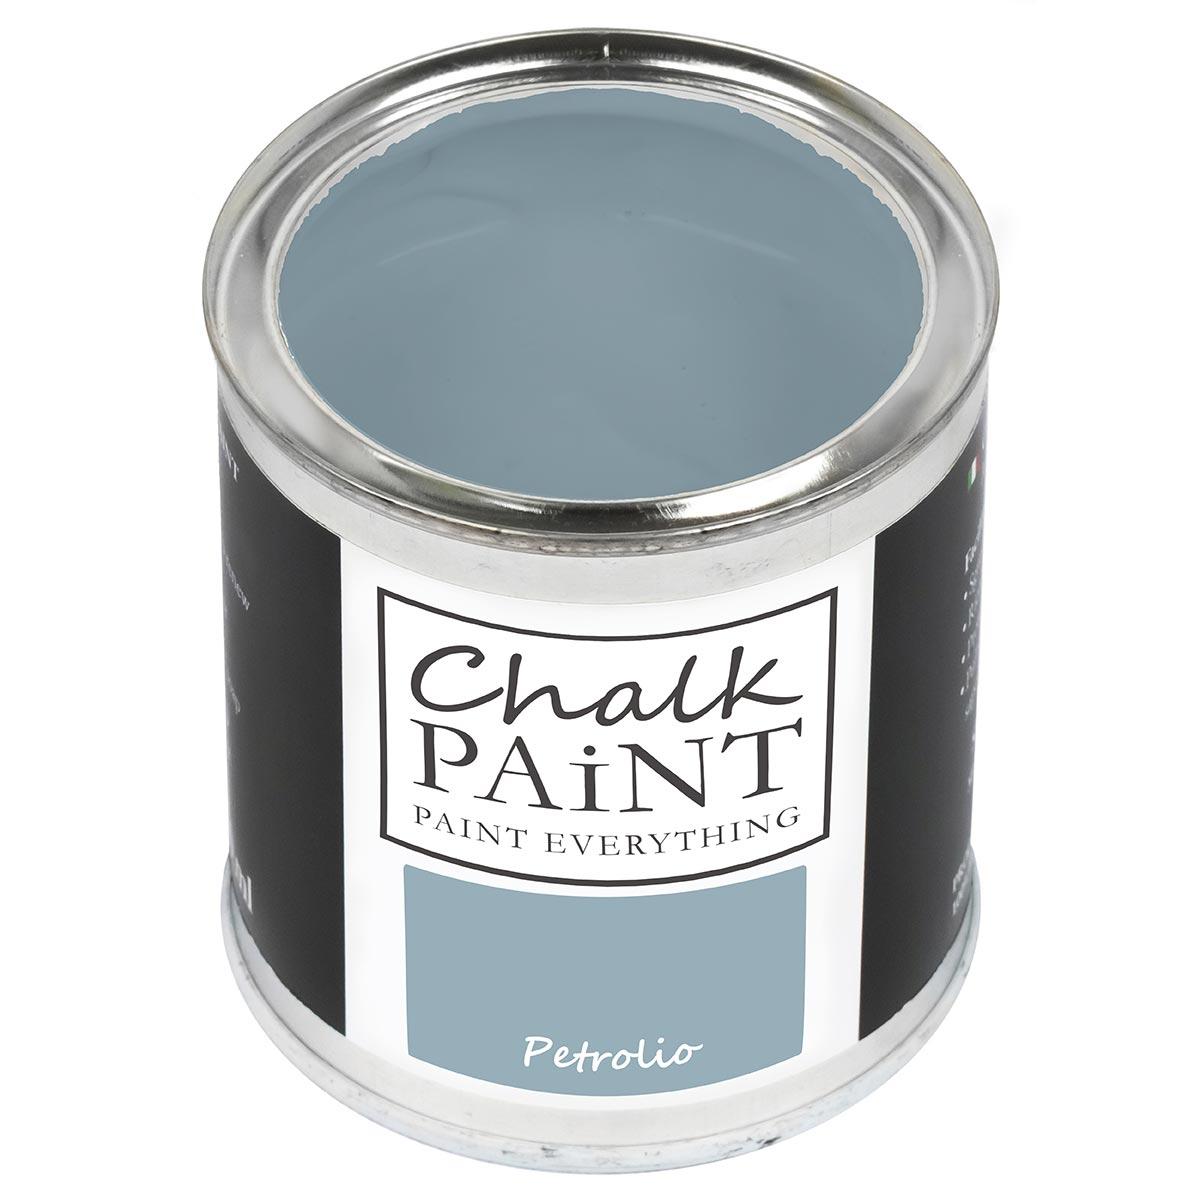 Chalk Paint Petrolio